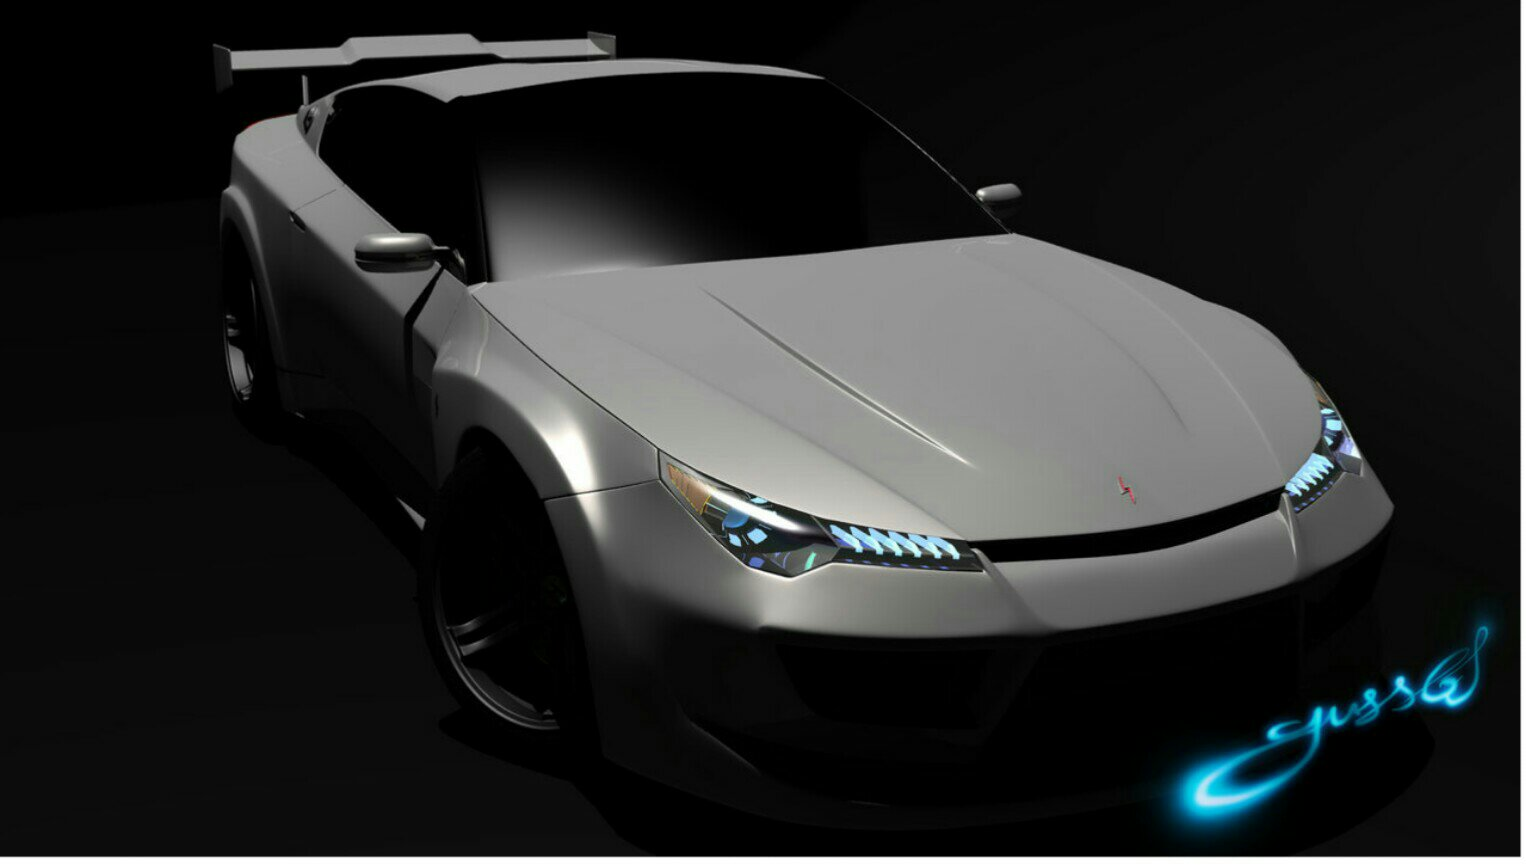 New Nissan Silvia S16